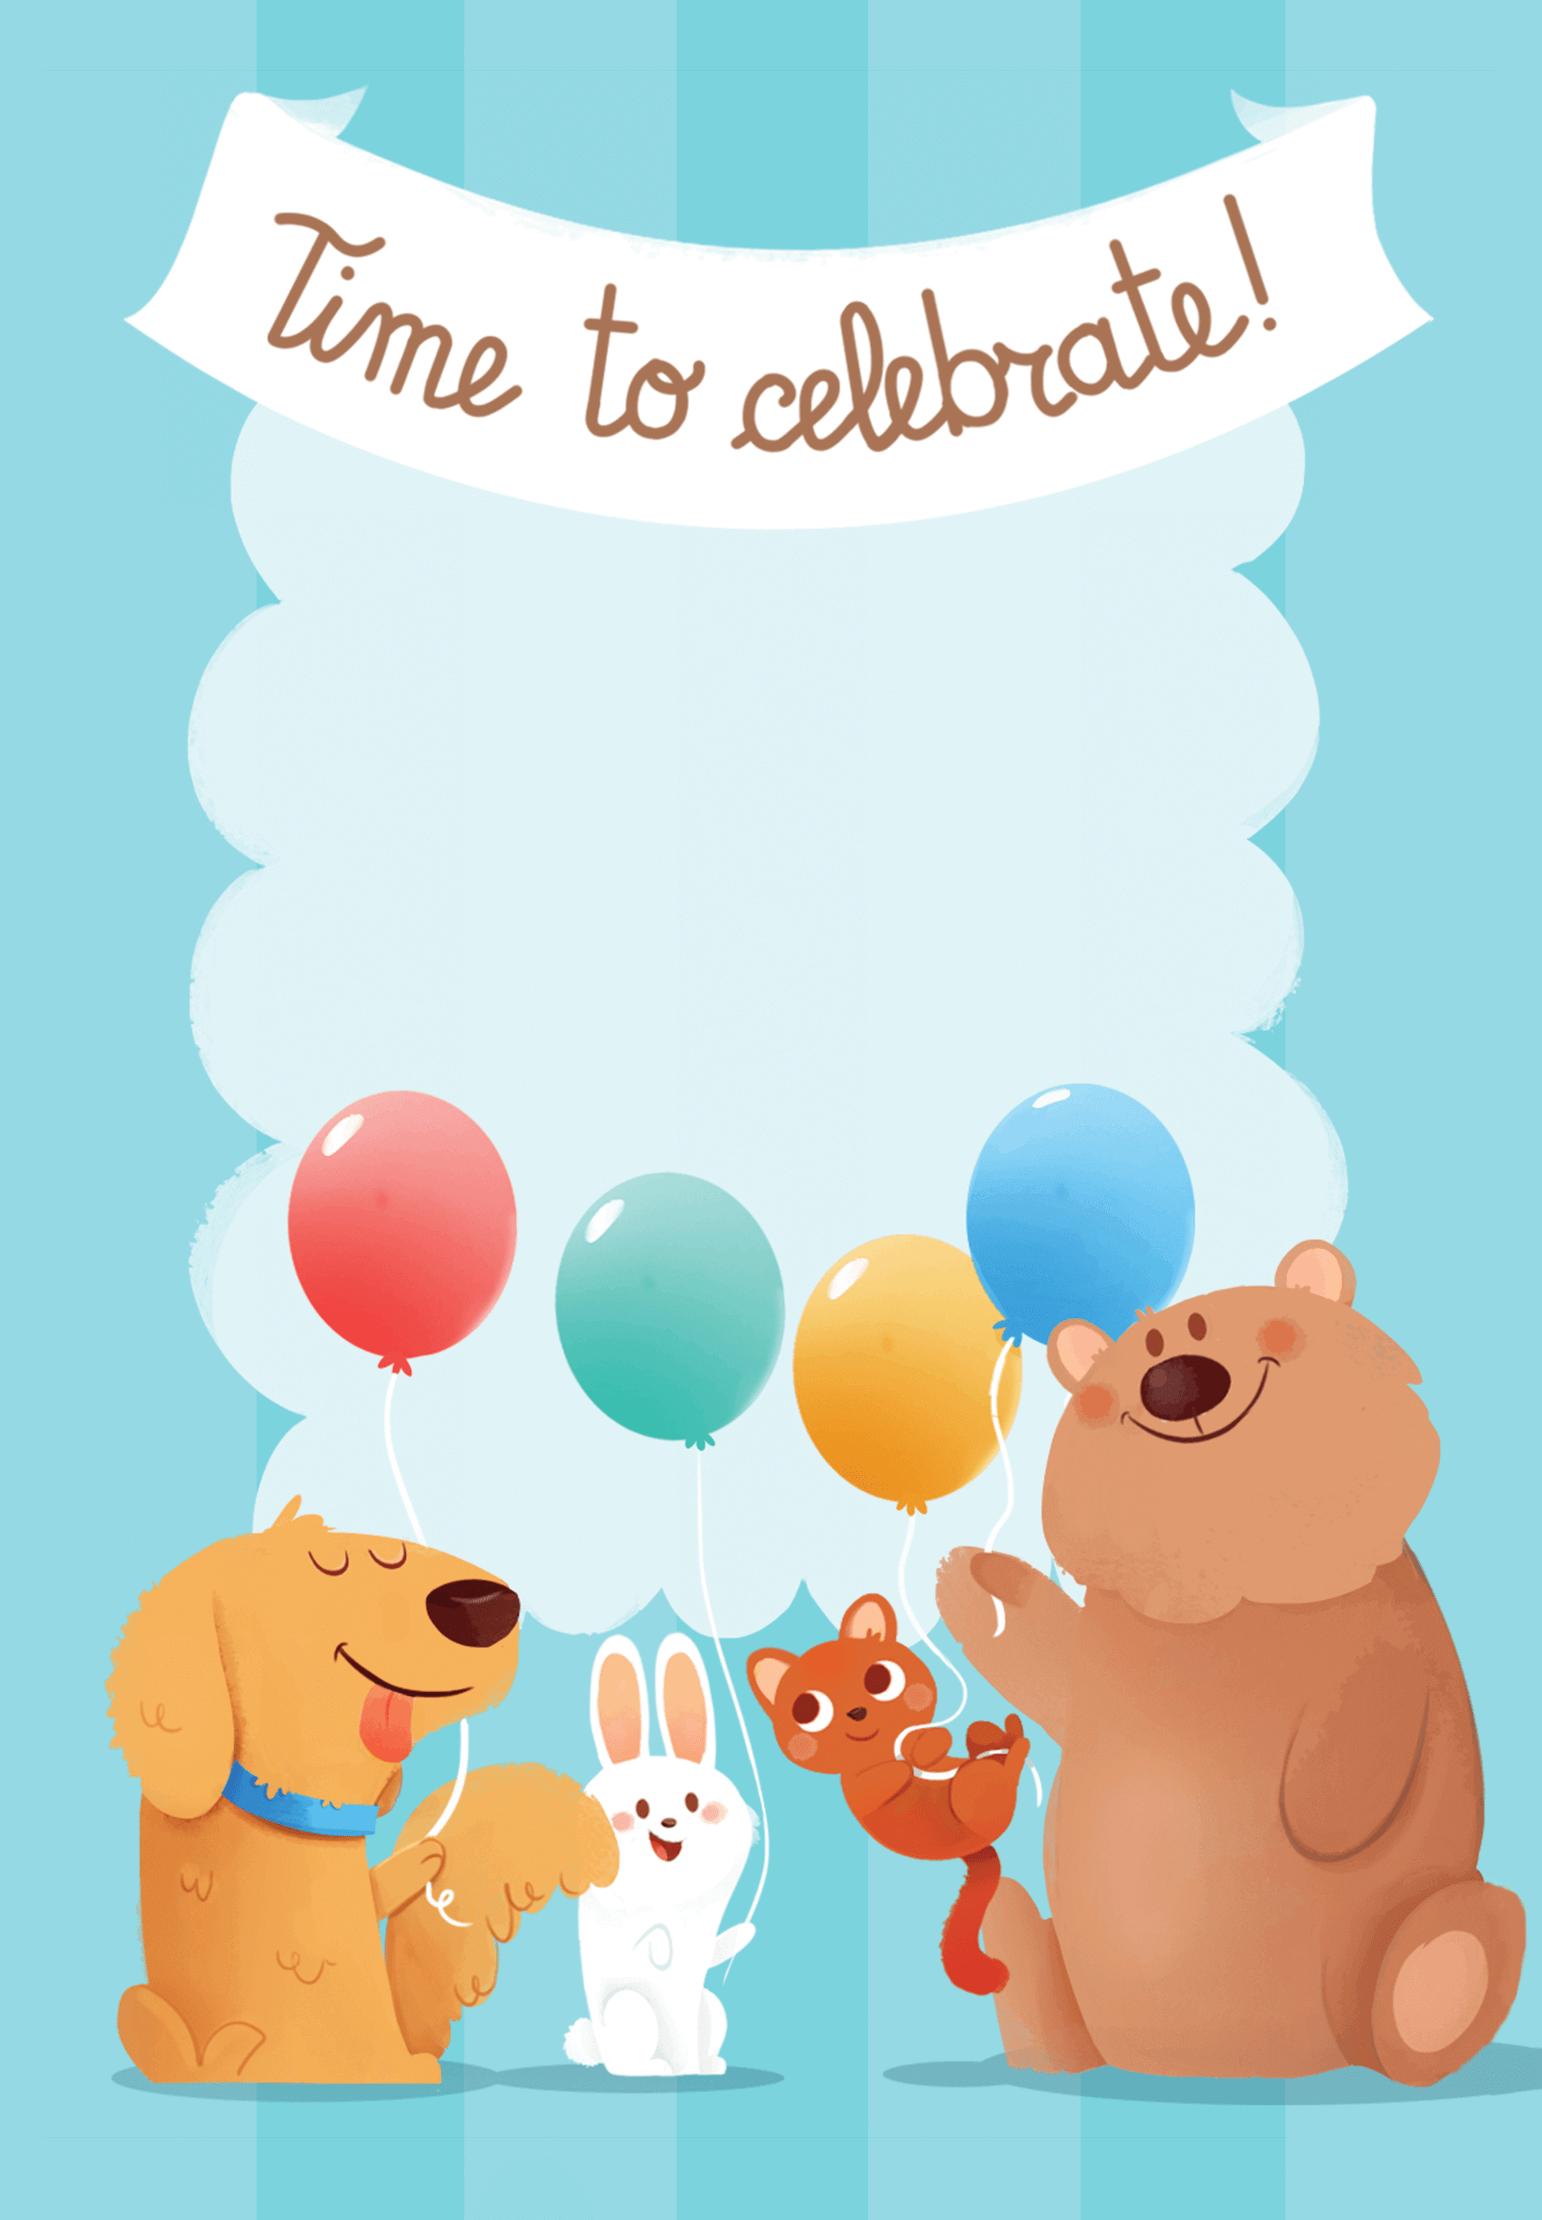 4th Birthday Animals Birthday Invitation Template Free Greetings Island Animal Birthday Invitation Birthday Invitations Birthday Invitation Templates